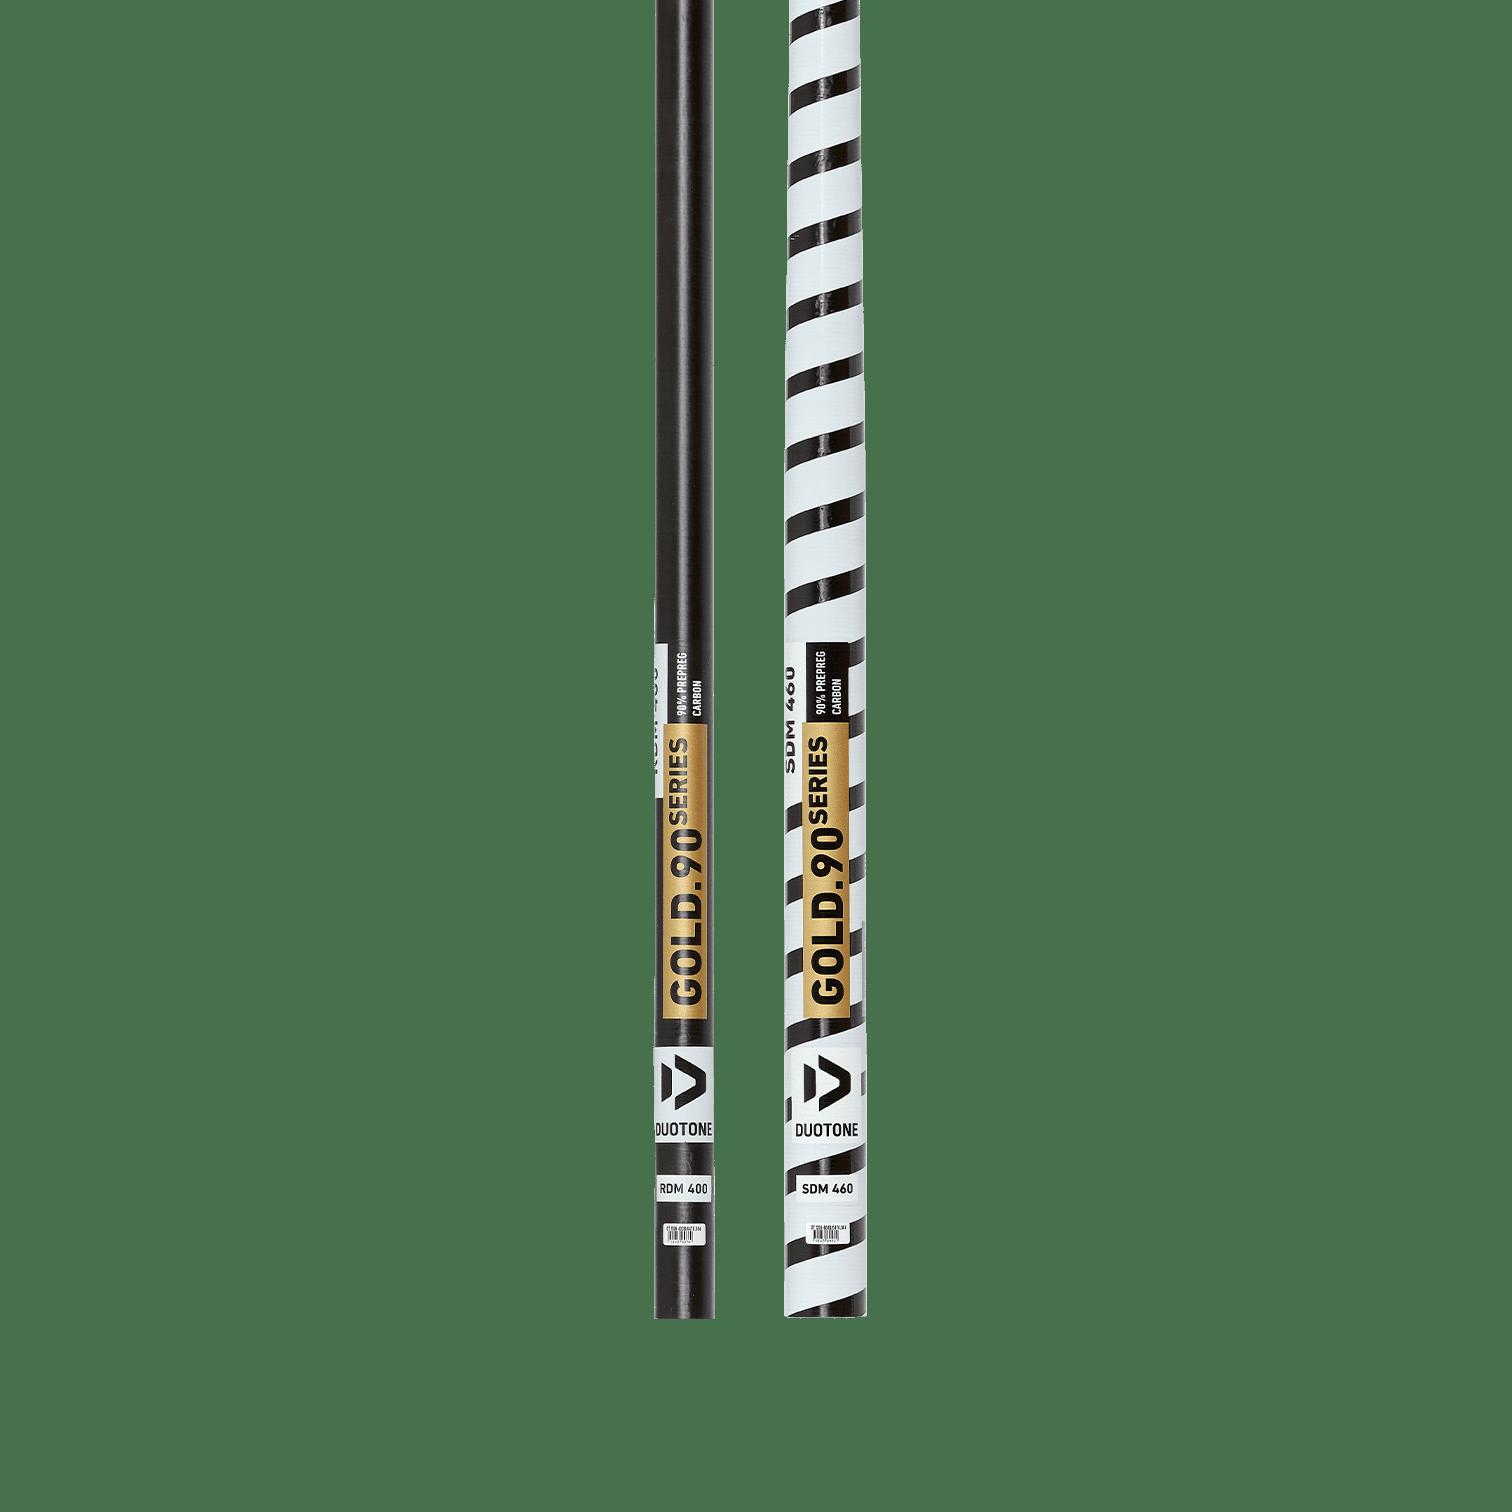 Duotone Gold 90% SDM Mast